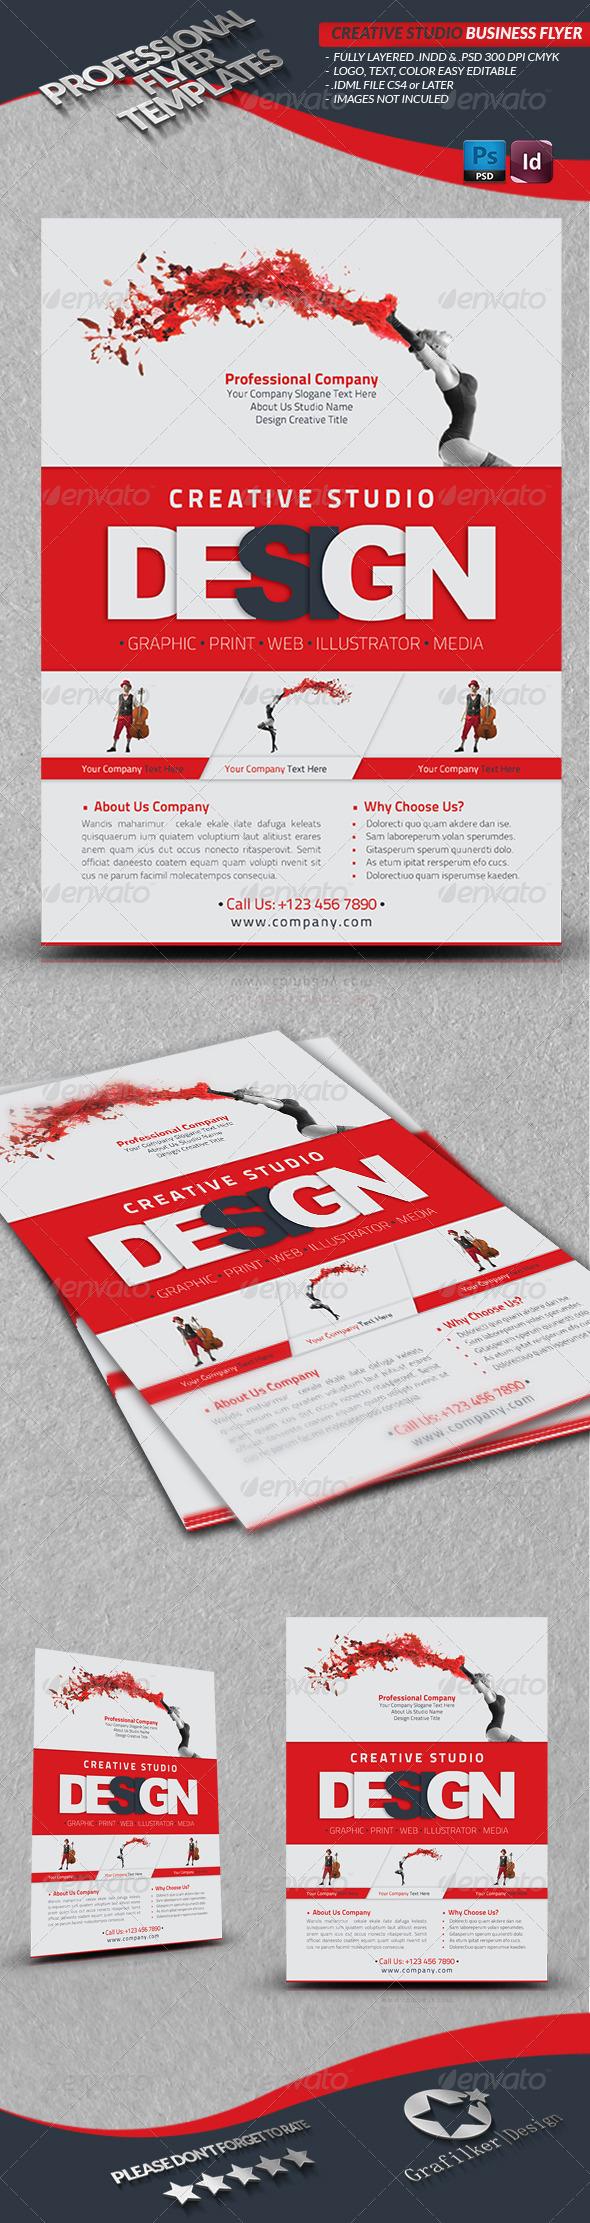 GraphicRiver Creative Studio Business Flyer 4153477